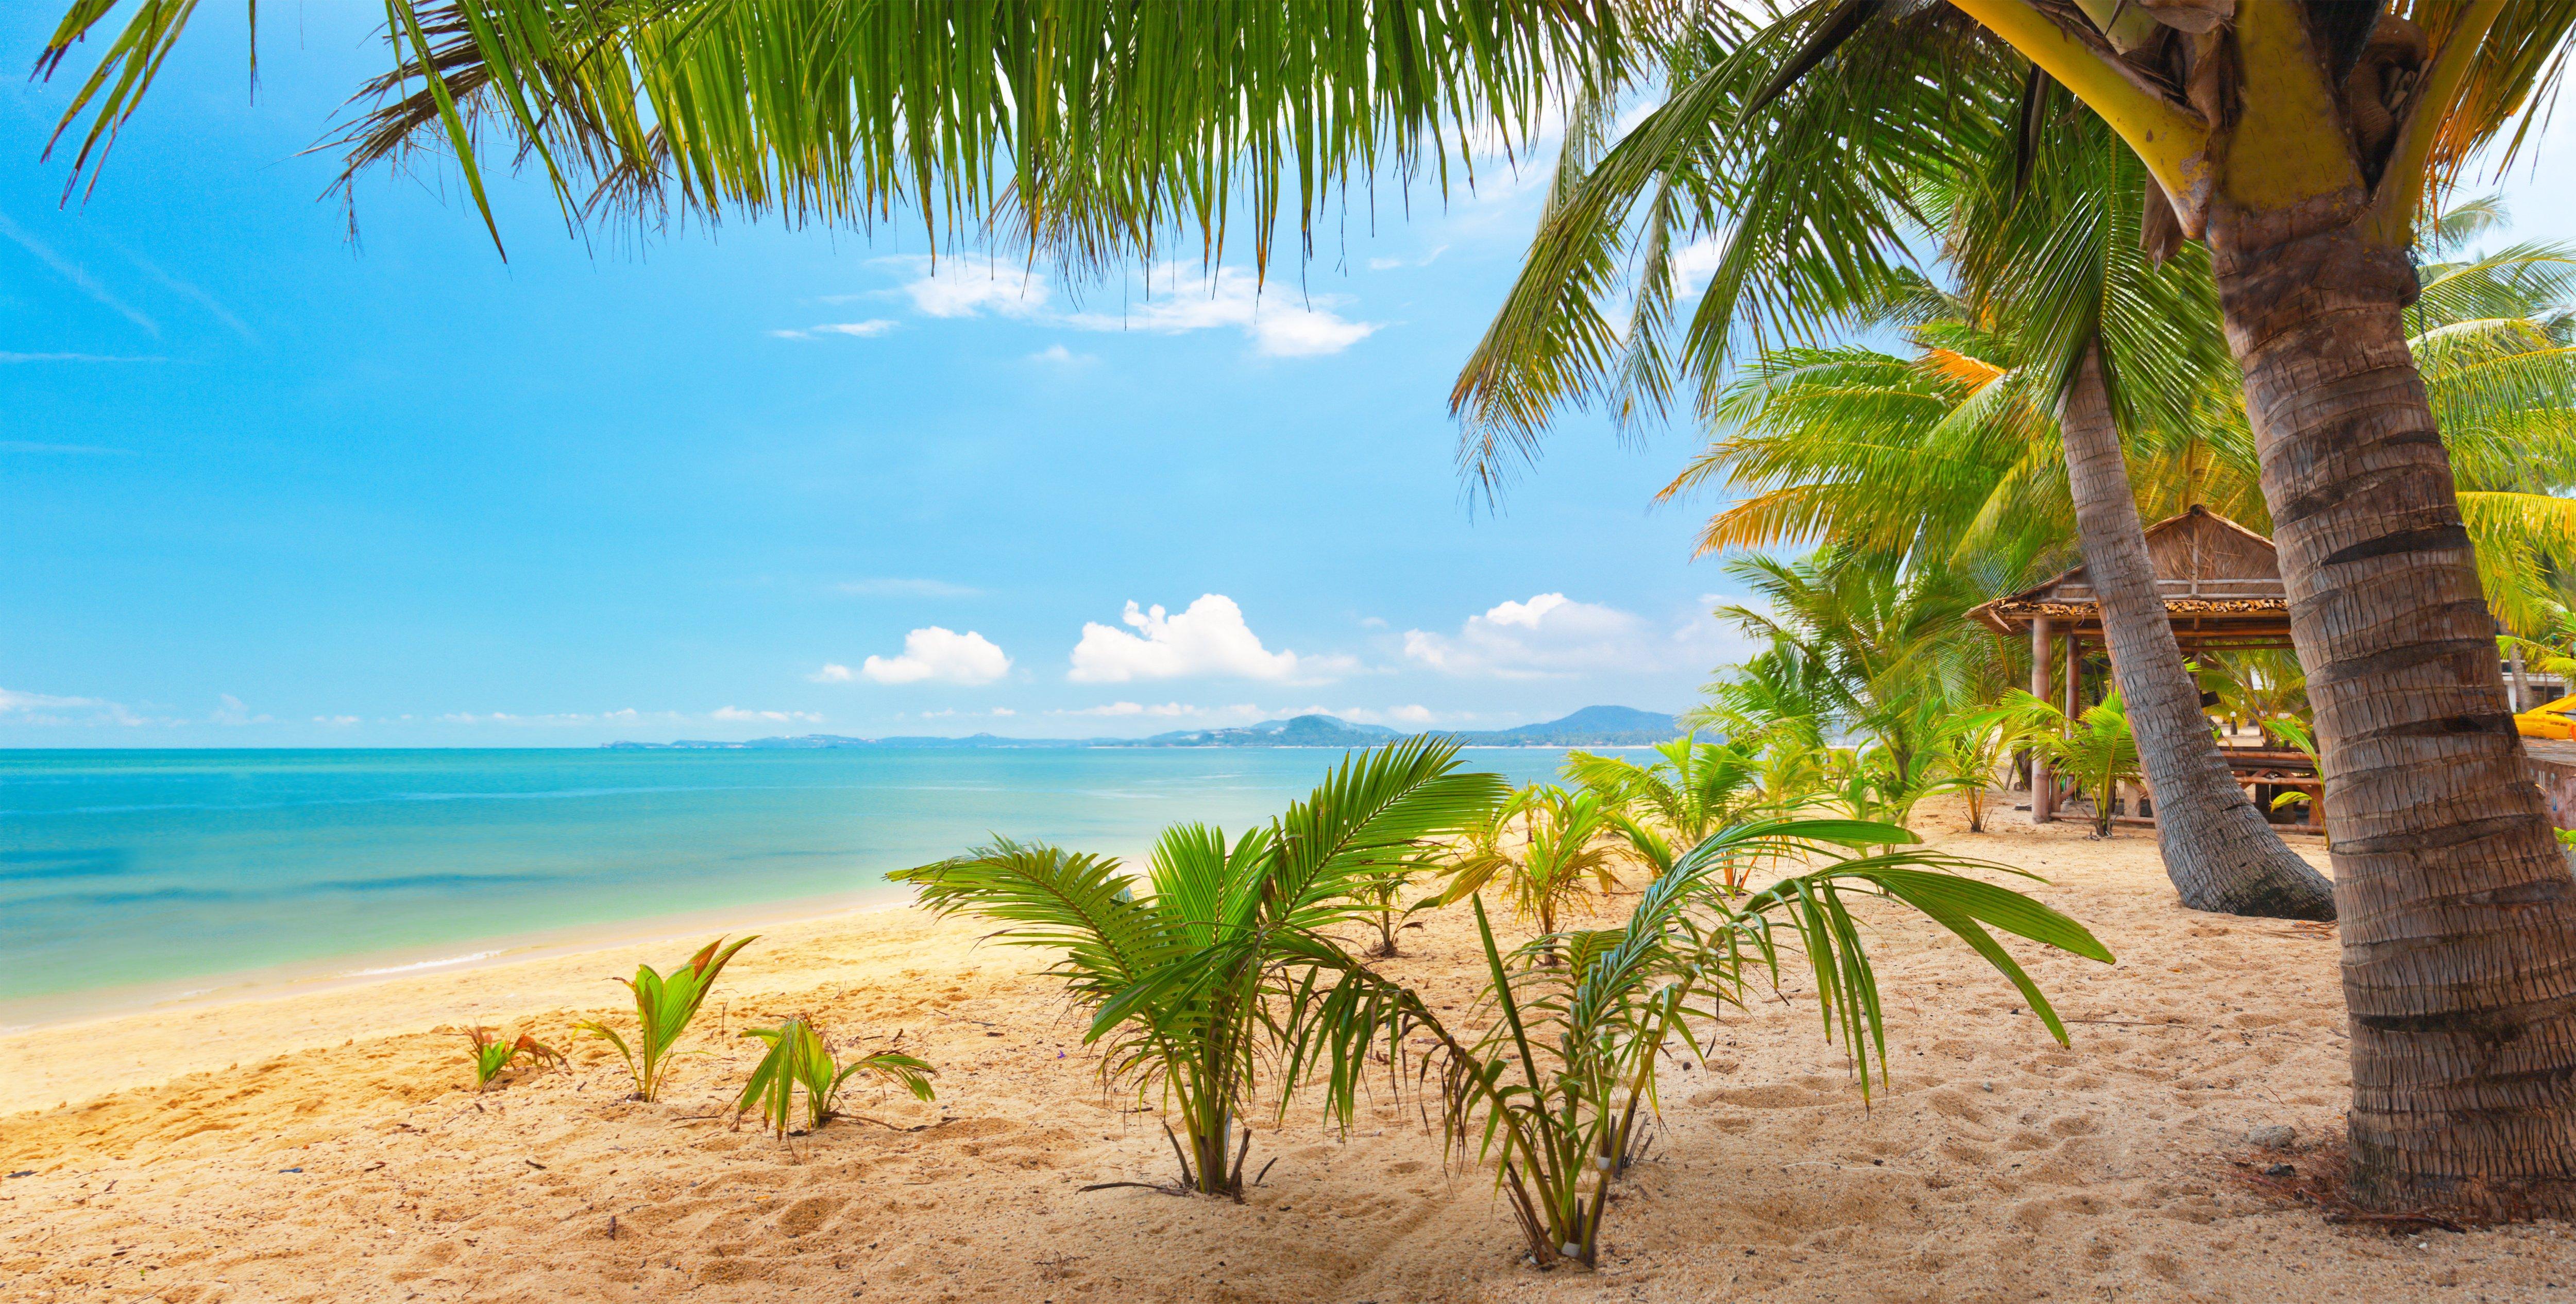 Sand Sea Sky Palm Trees Nature Tropical Landscape Beautiful Wallpaper    5000x2532   282331   WallpaperUP